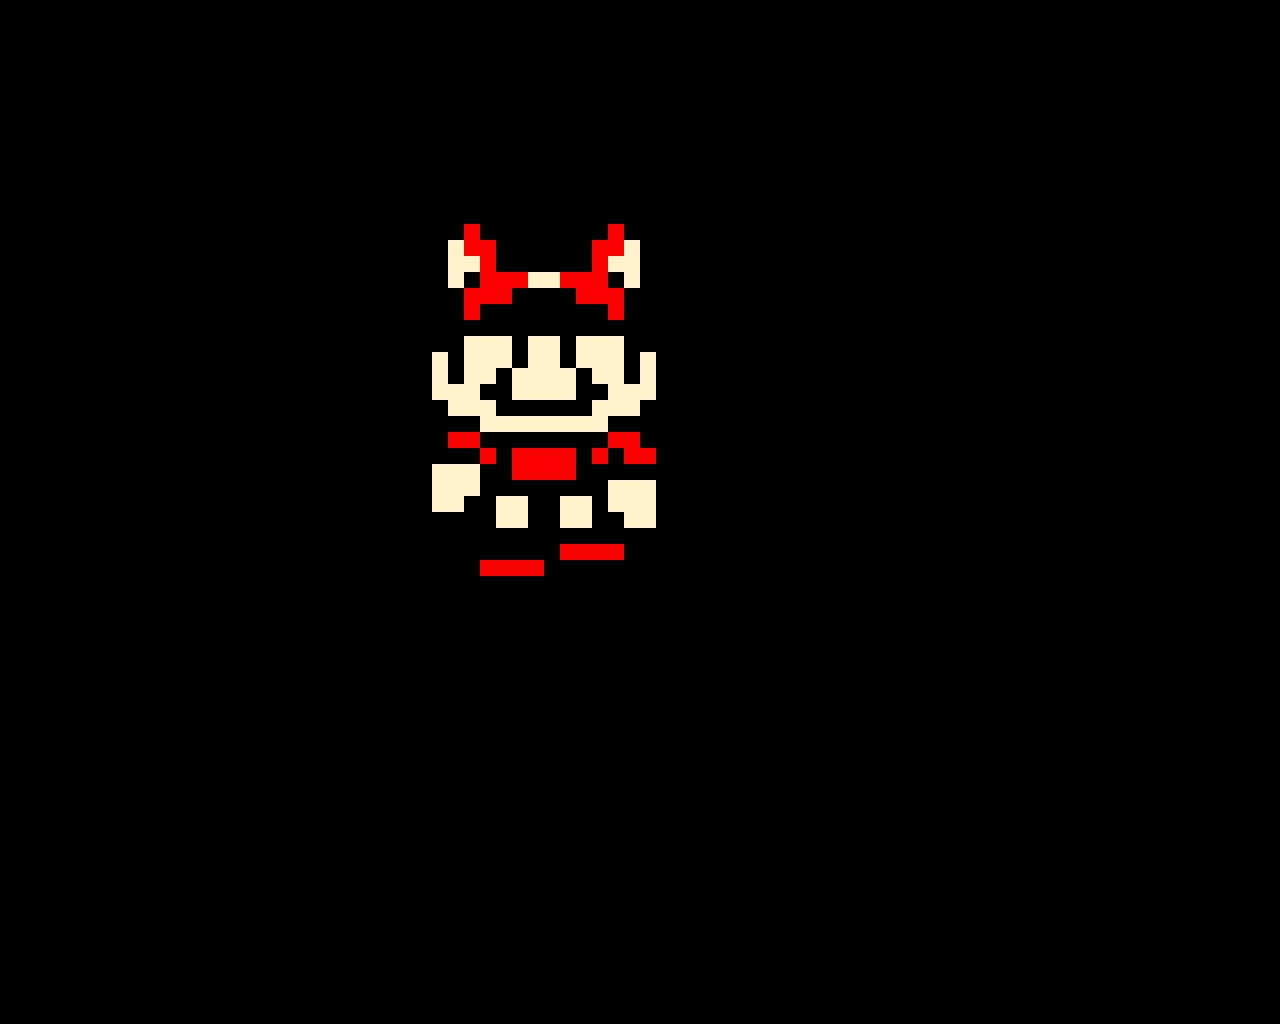 SMB3 Racoon Mario Overworld Sprite